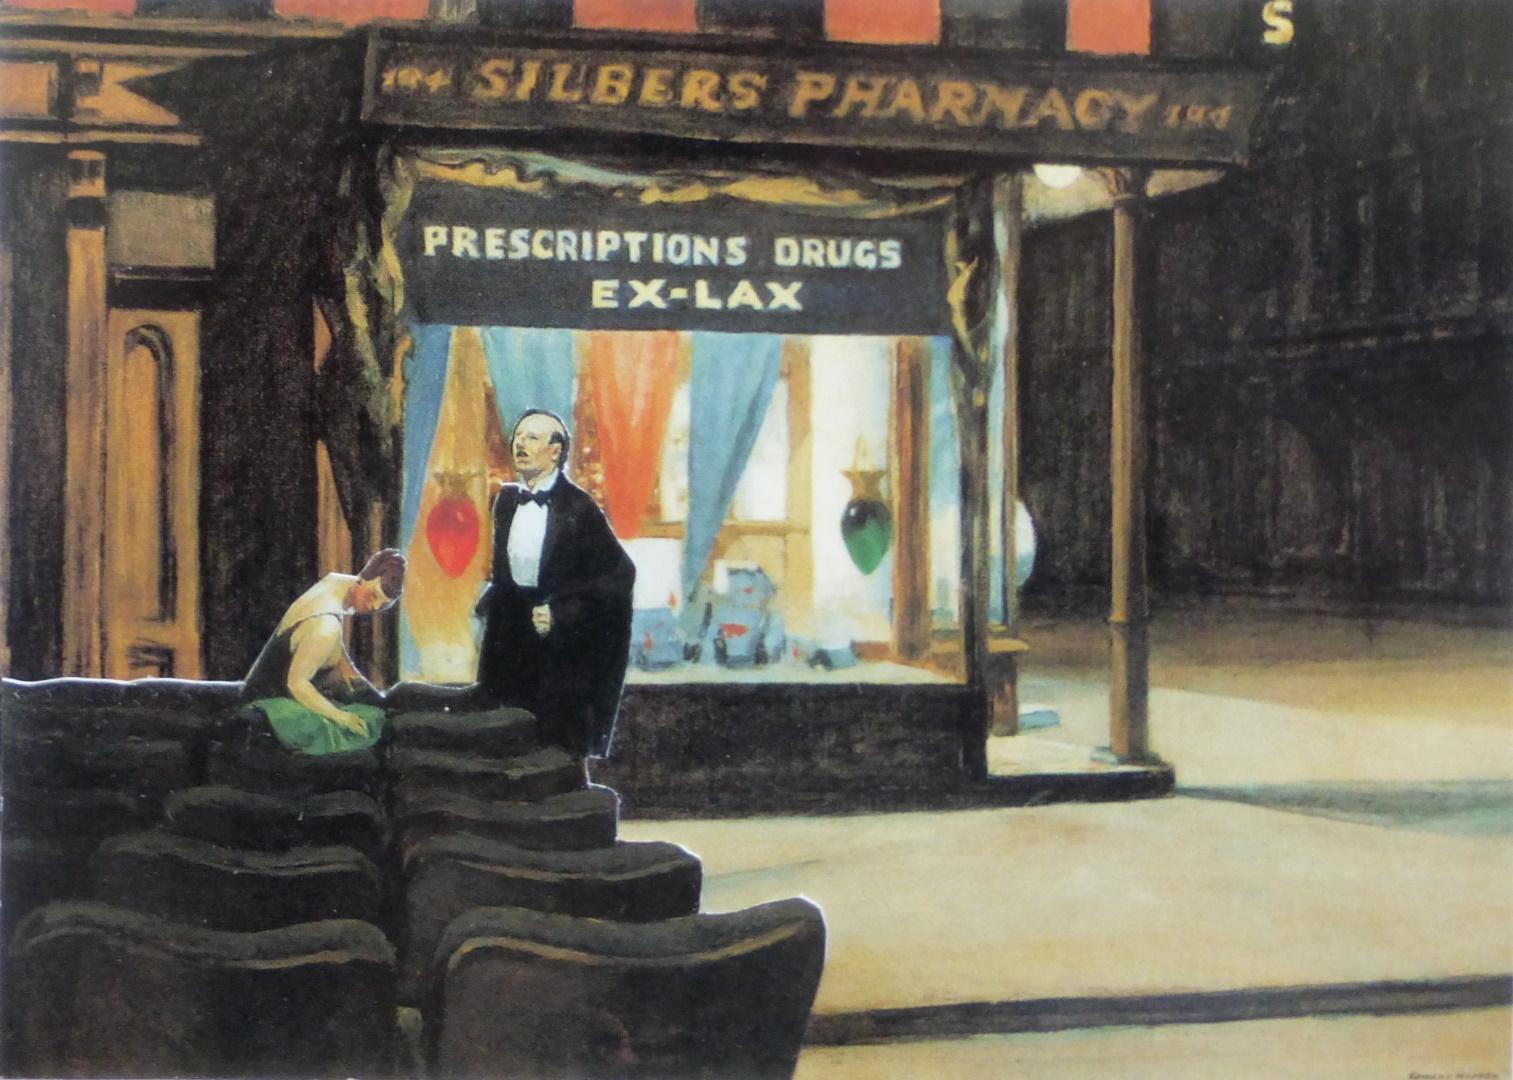 Drugstore on the Aisle